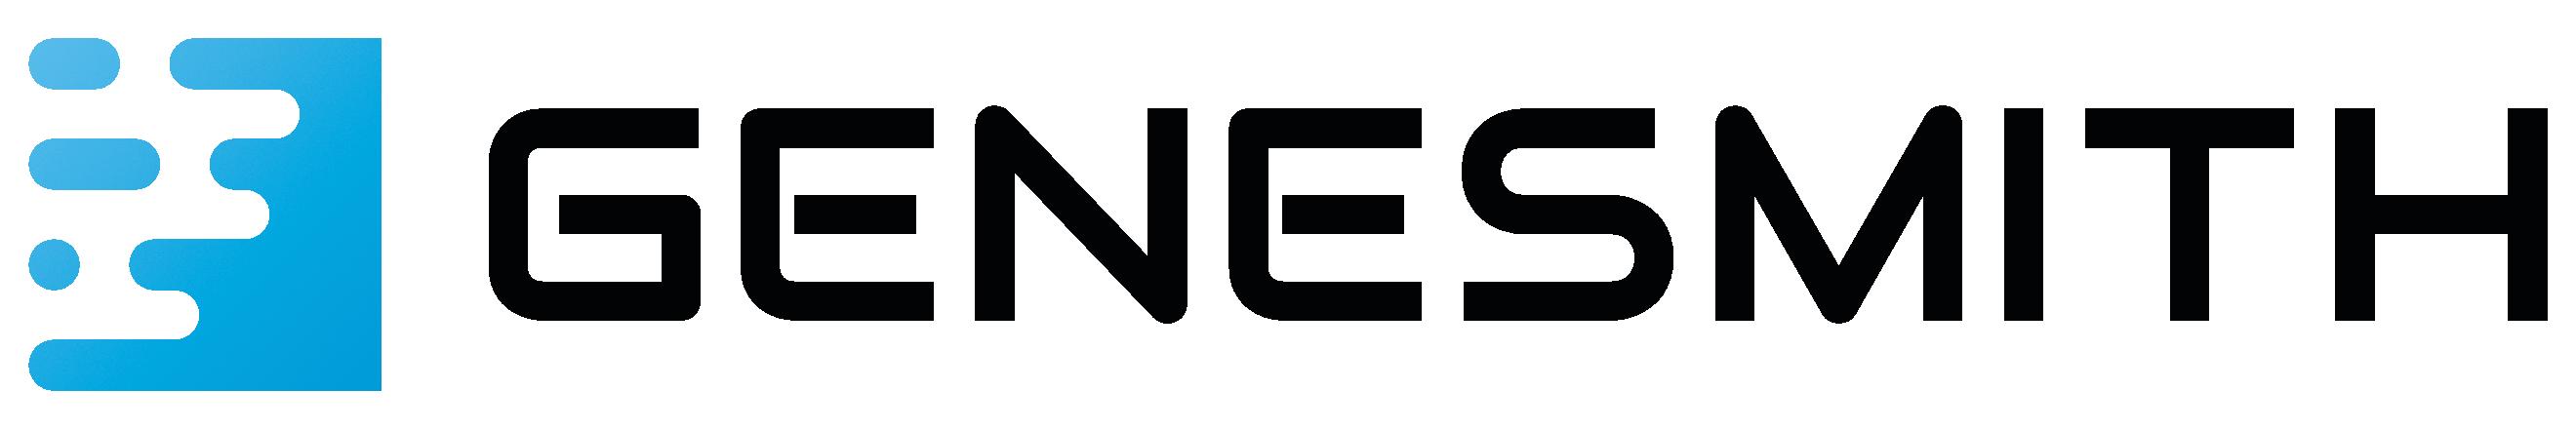 Genesmith a partner company for neXtgen Agri.